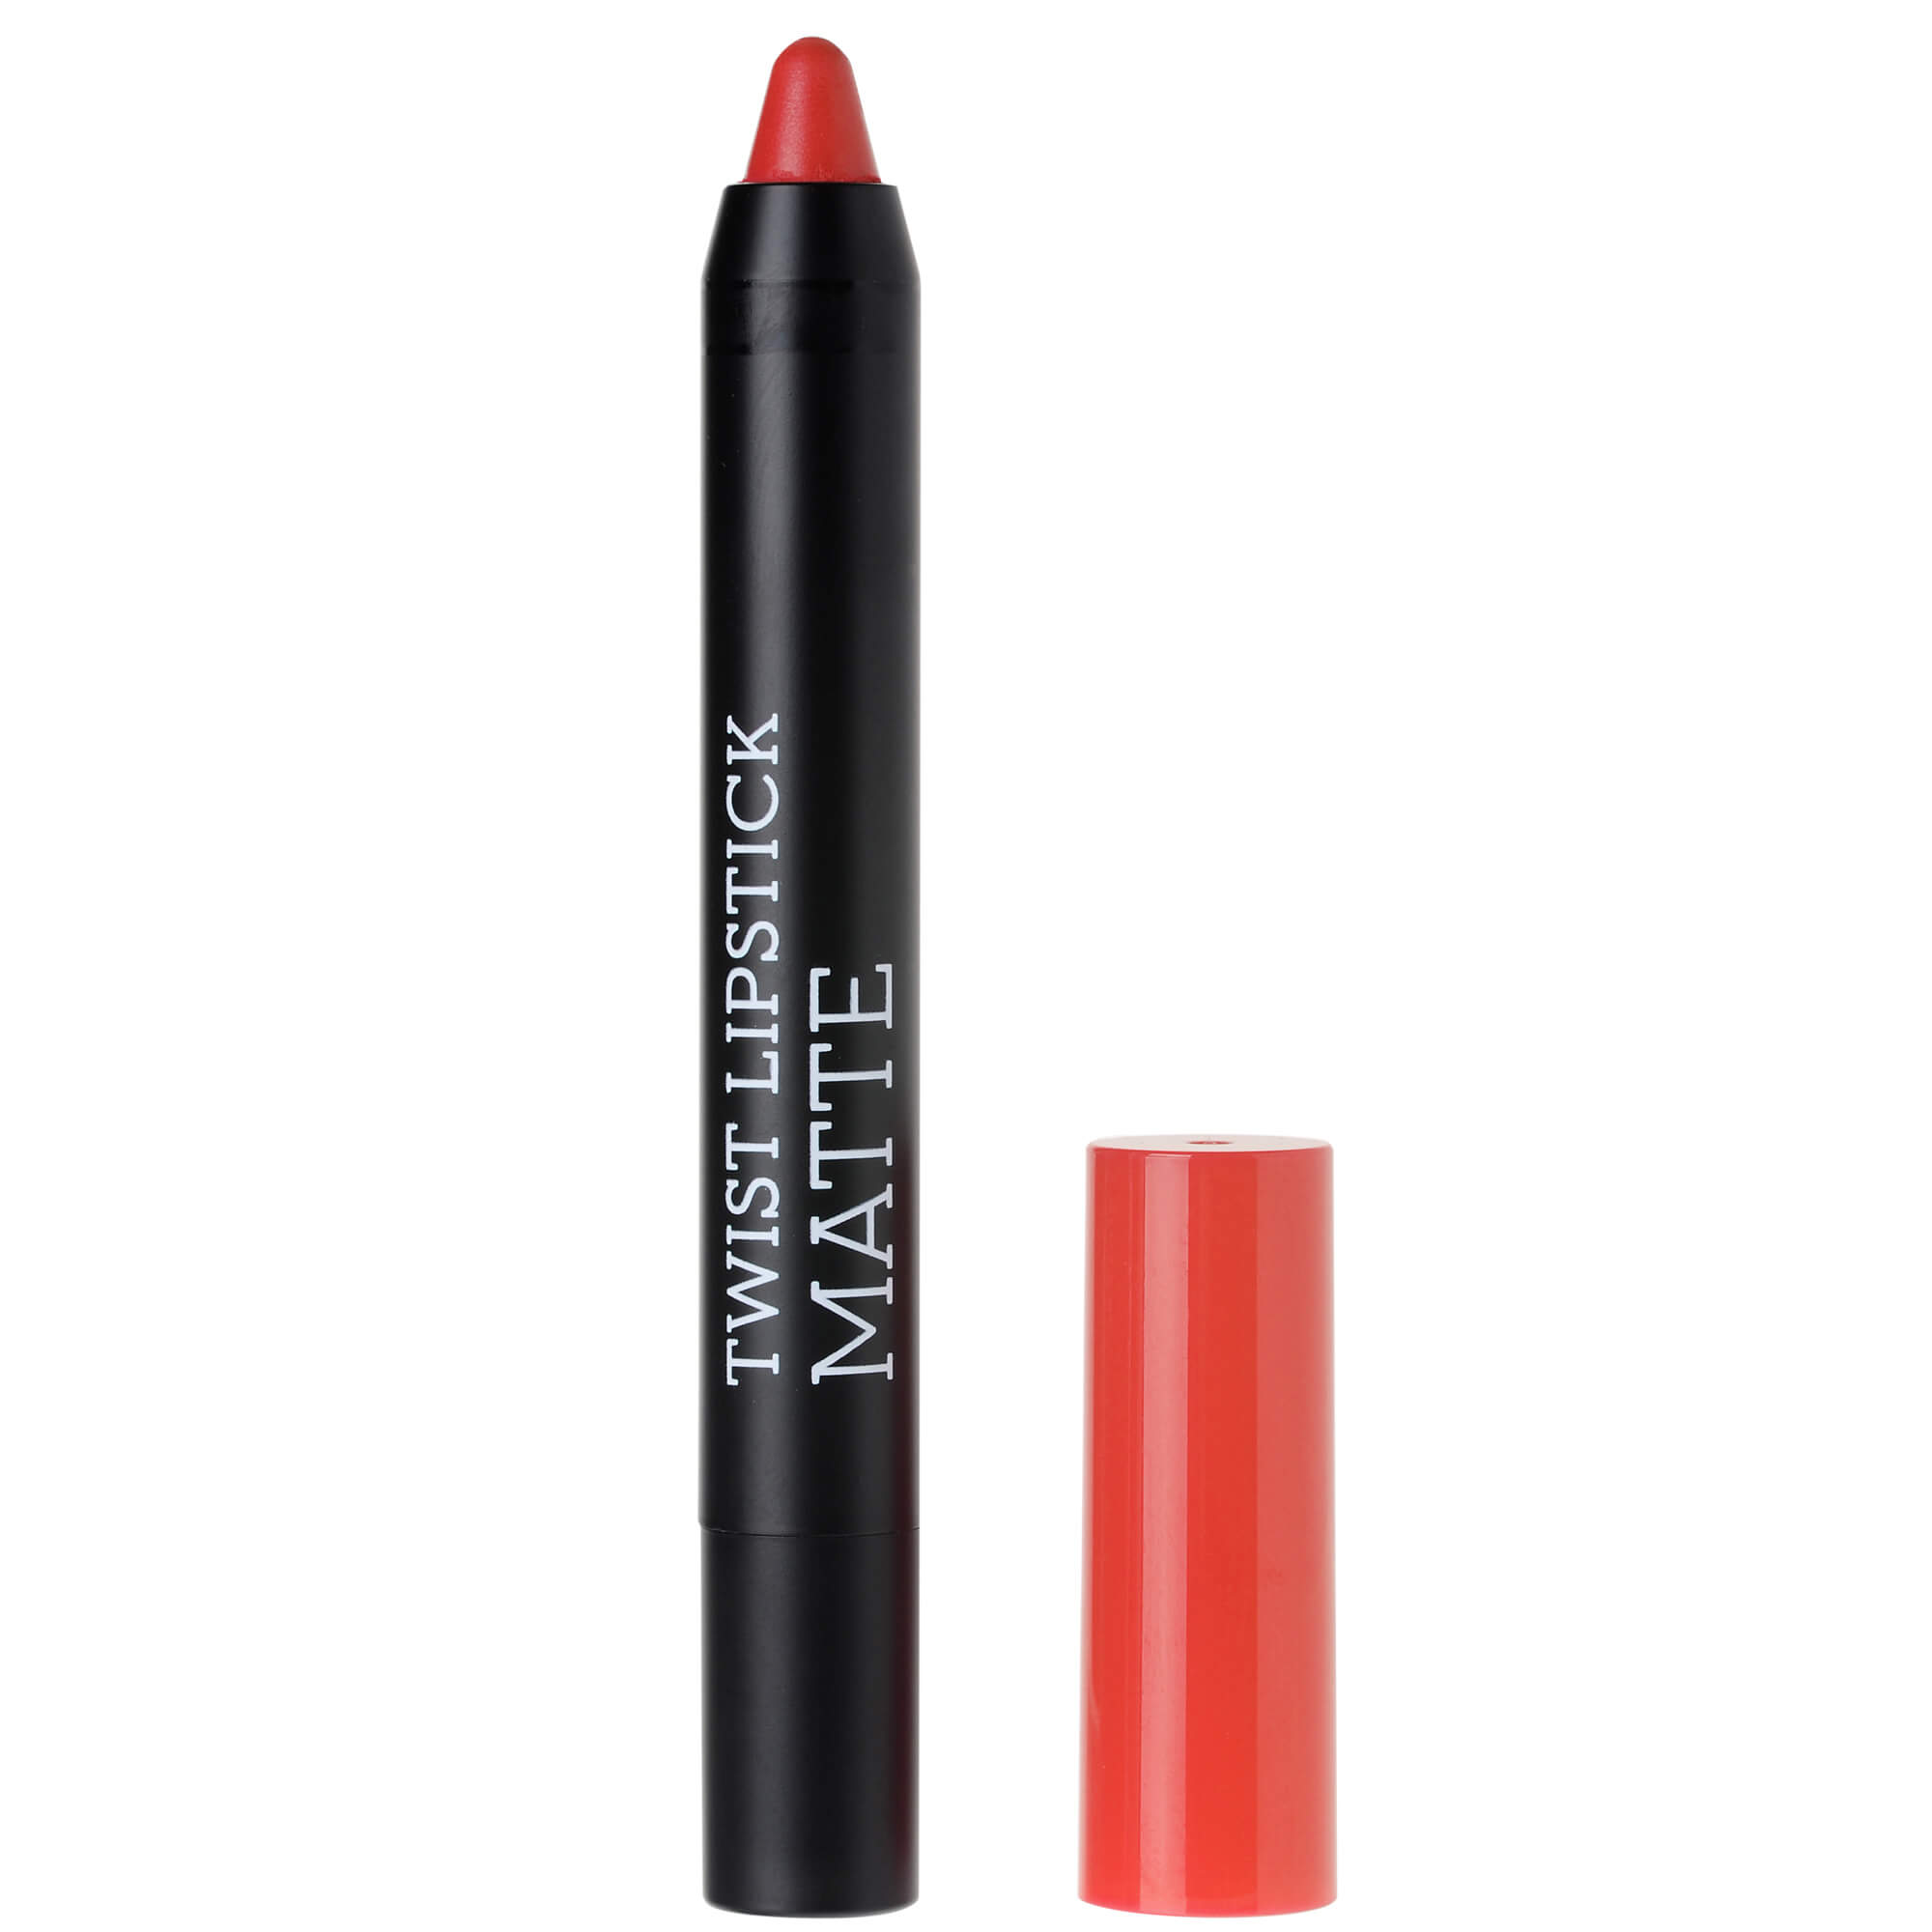 Korres Twist Lipstick Matte, Ultra Mat Αποτέλεσμα, Έντονο Χρώμα, Απόλυτη Άνεση στα Χείλη 1.5gr – Tempting Coral